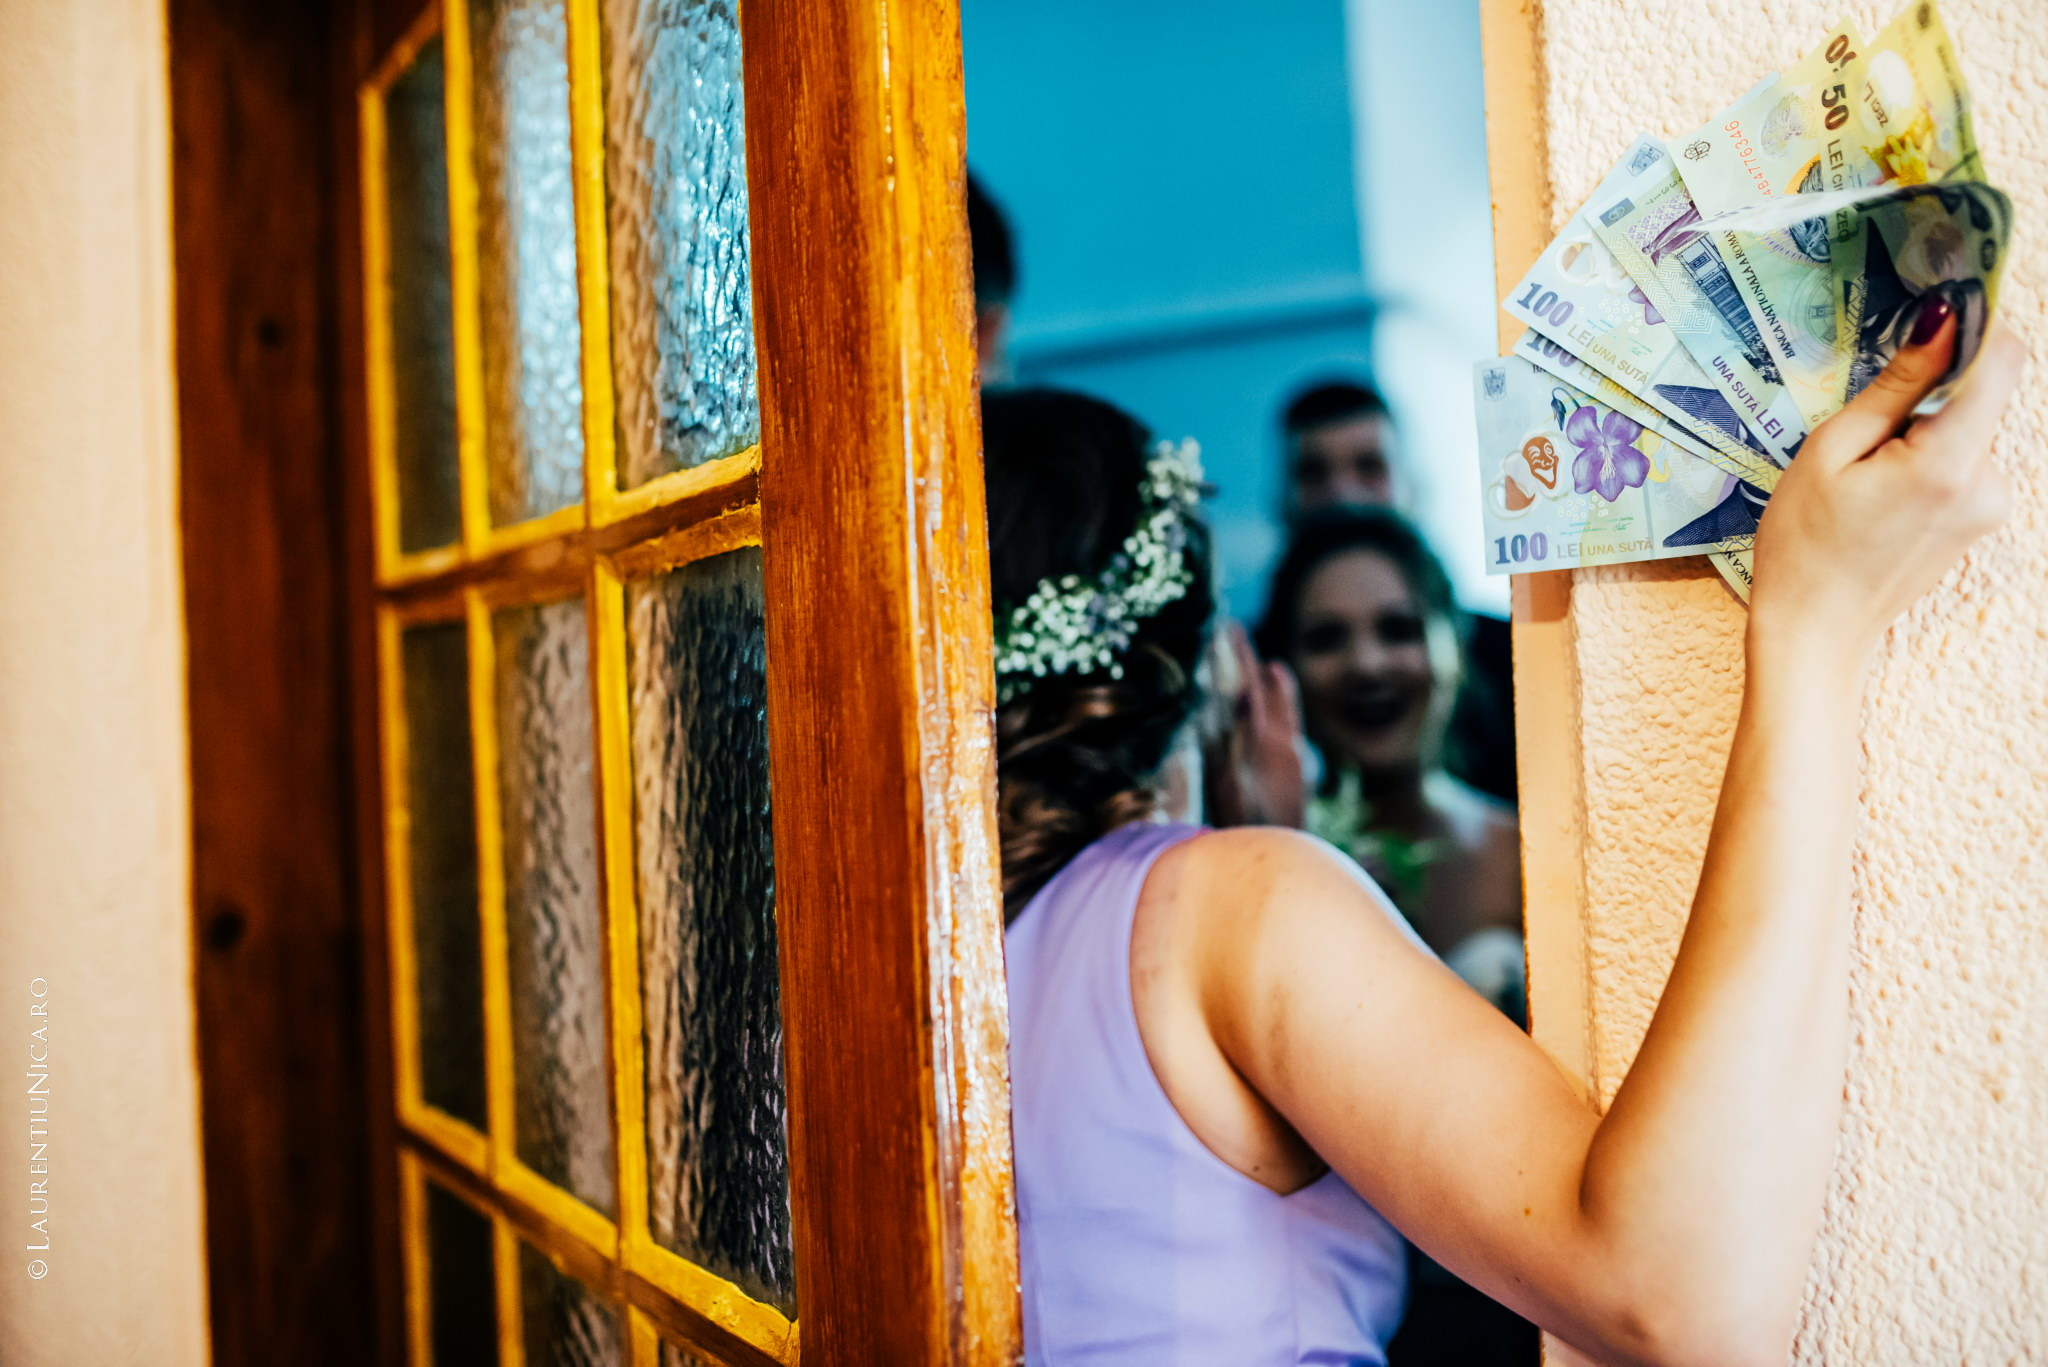 fotografii nunta craiova bia alex fotograf nunta laurentiu nica 17 - Bia & Alex | Fotografii nunta | Craiova